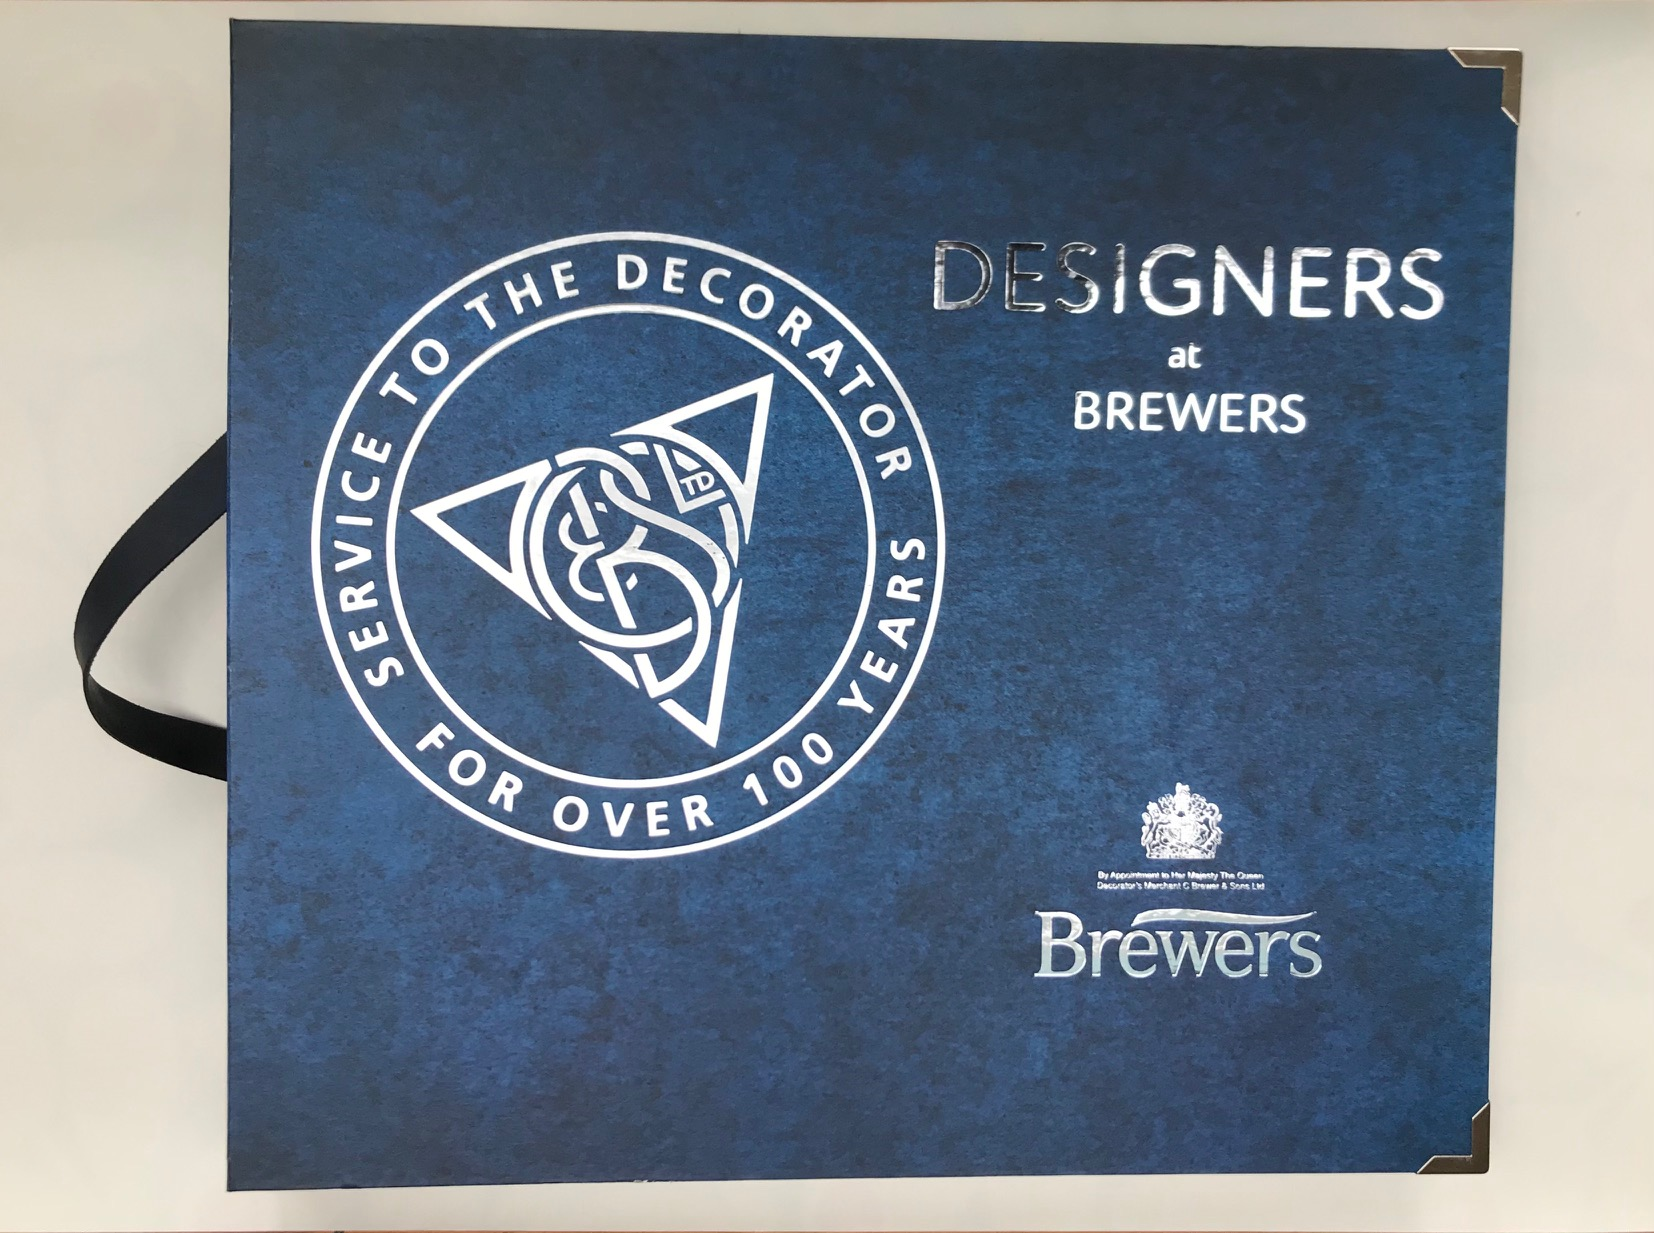 Wallpaper book club – Designers at Brewers